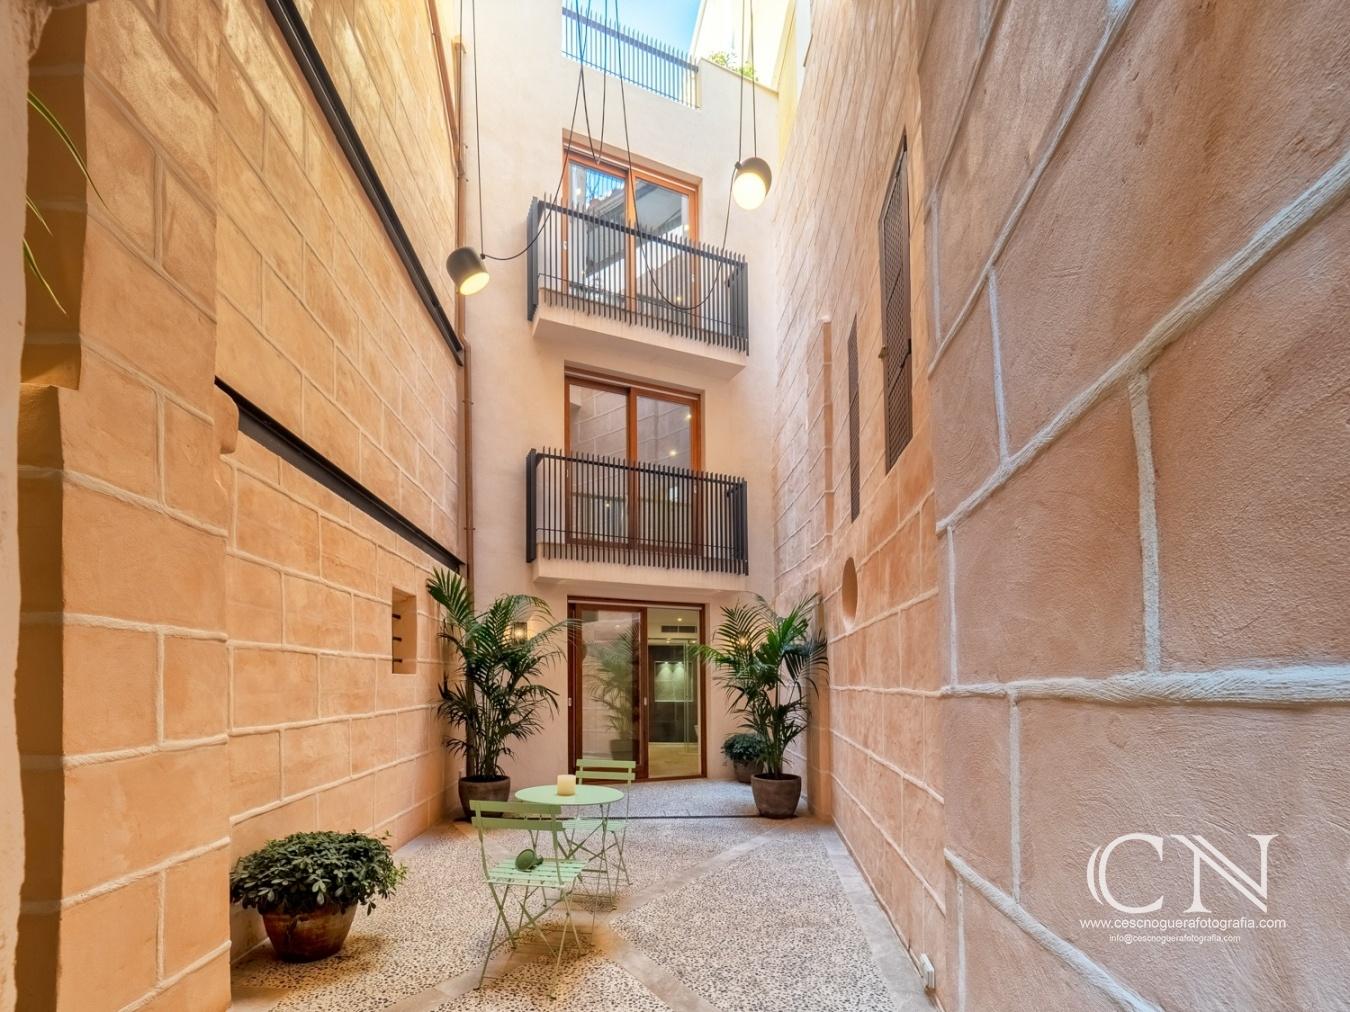 Casa a Rambla de Palma - Cesc Noguera Fotografie, Wenn Fotografie ist eine Leidenschaft, Architectural & Interior design photographer / Landscape Photography